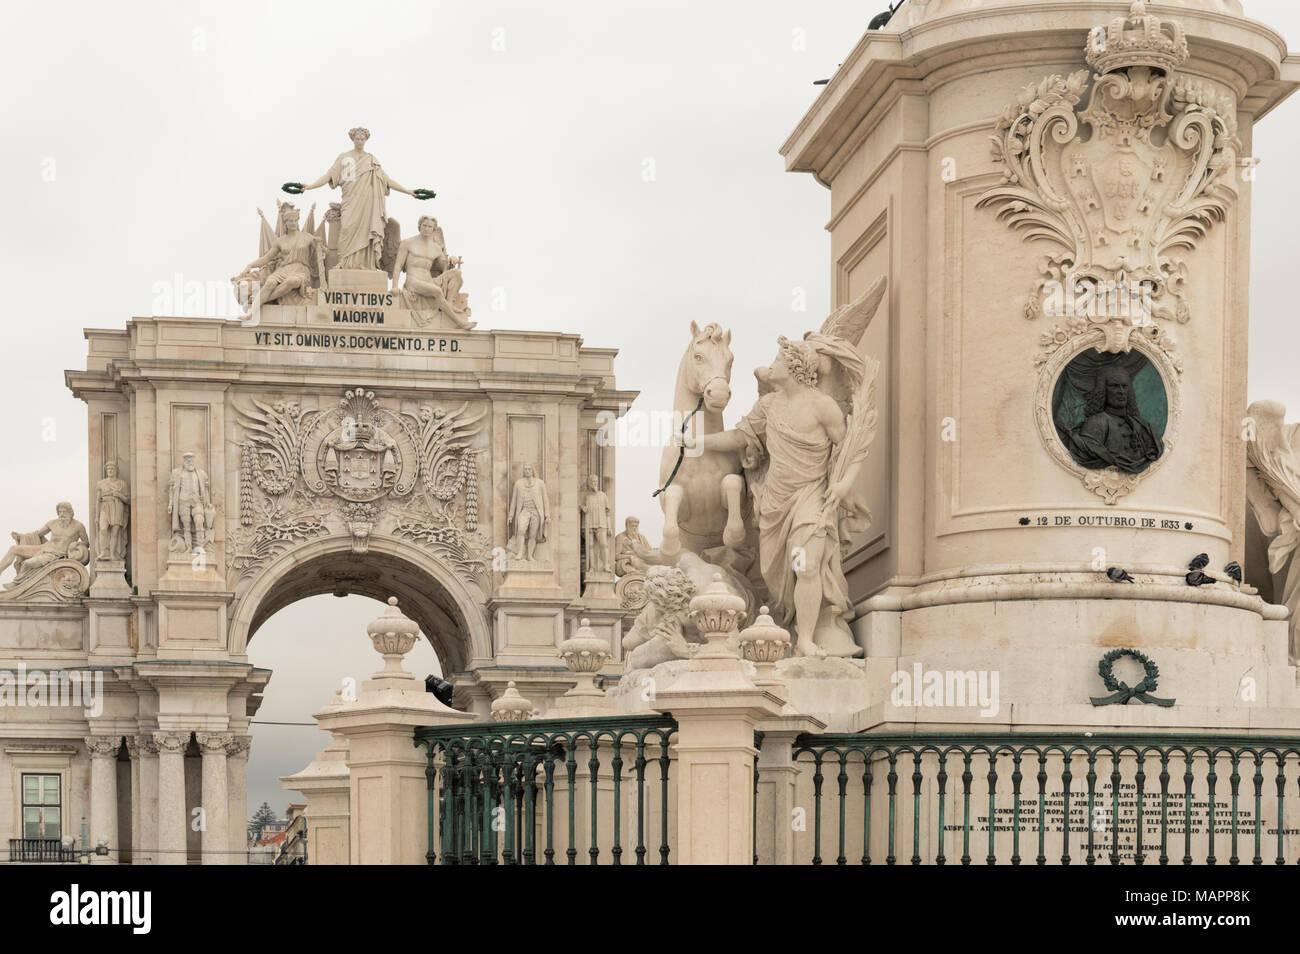 The Rua Augusta arch in the Praca do Comercio - Stock Image